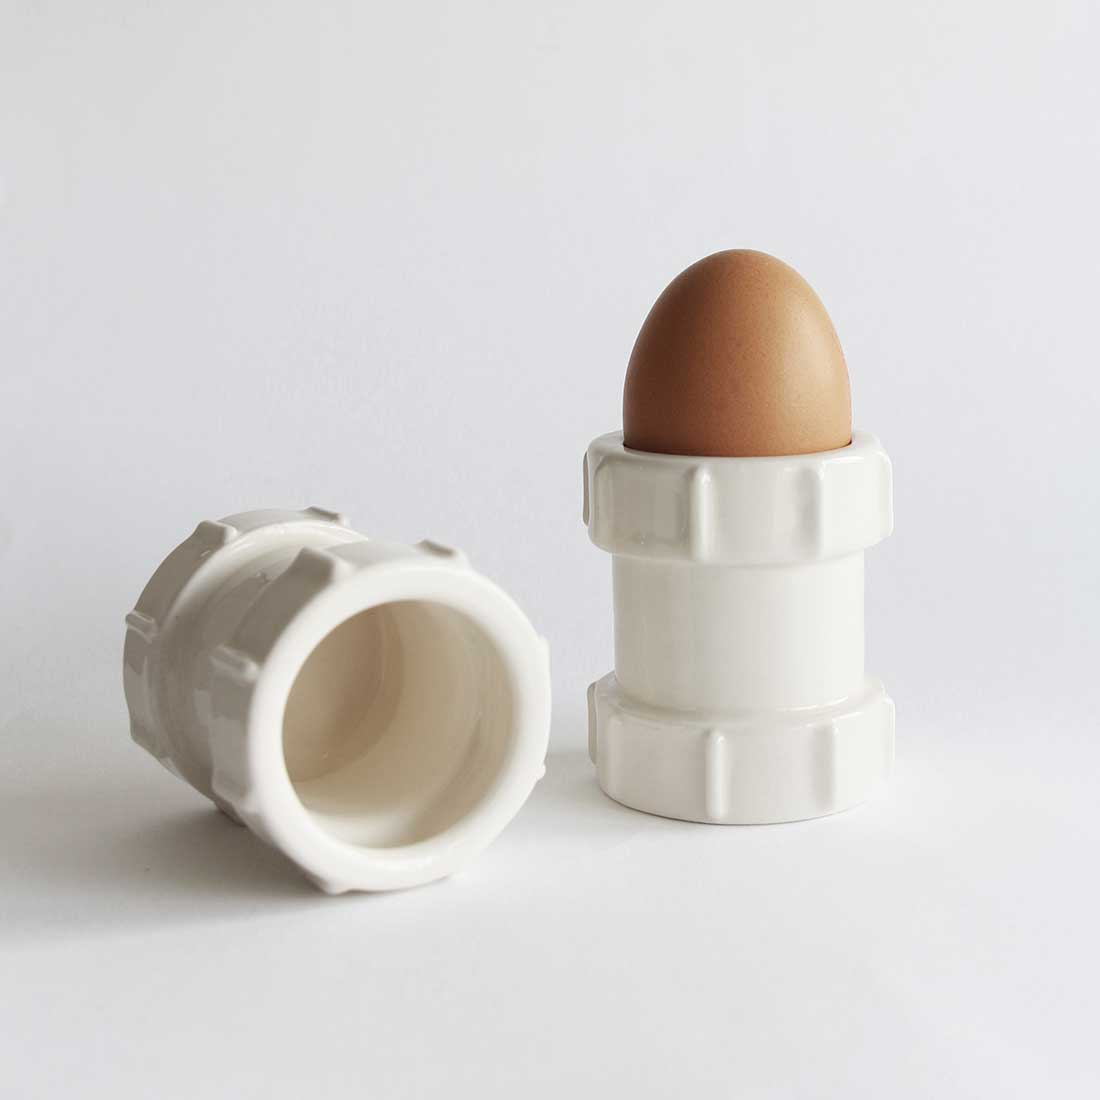 Stolen Form Set of 2 Pipe Egg Cups